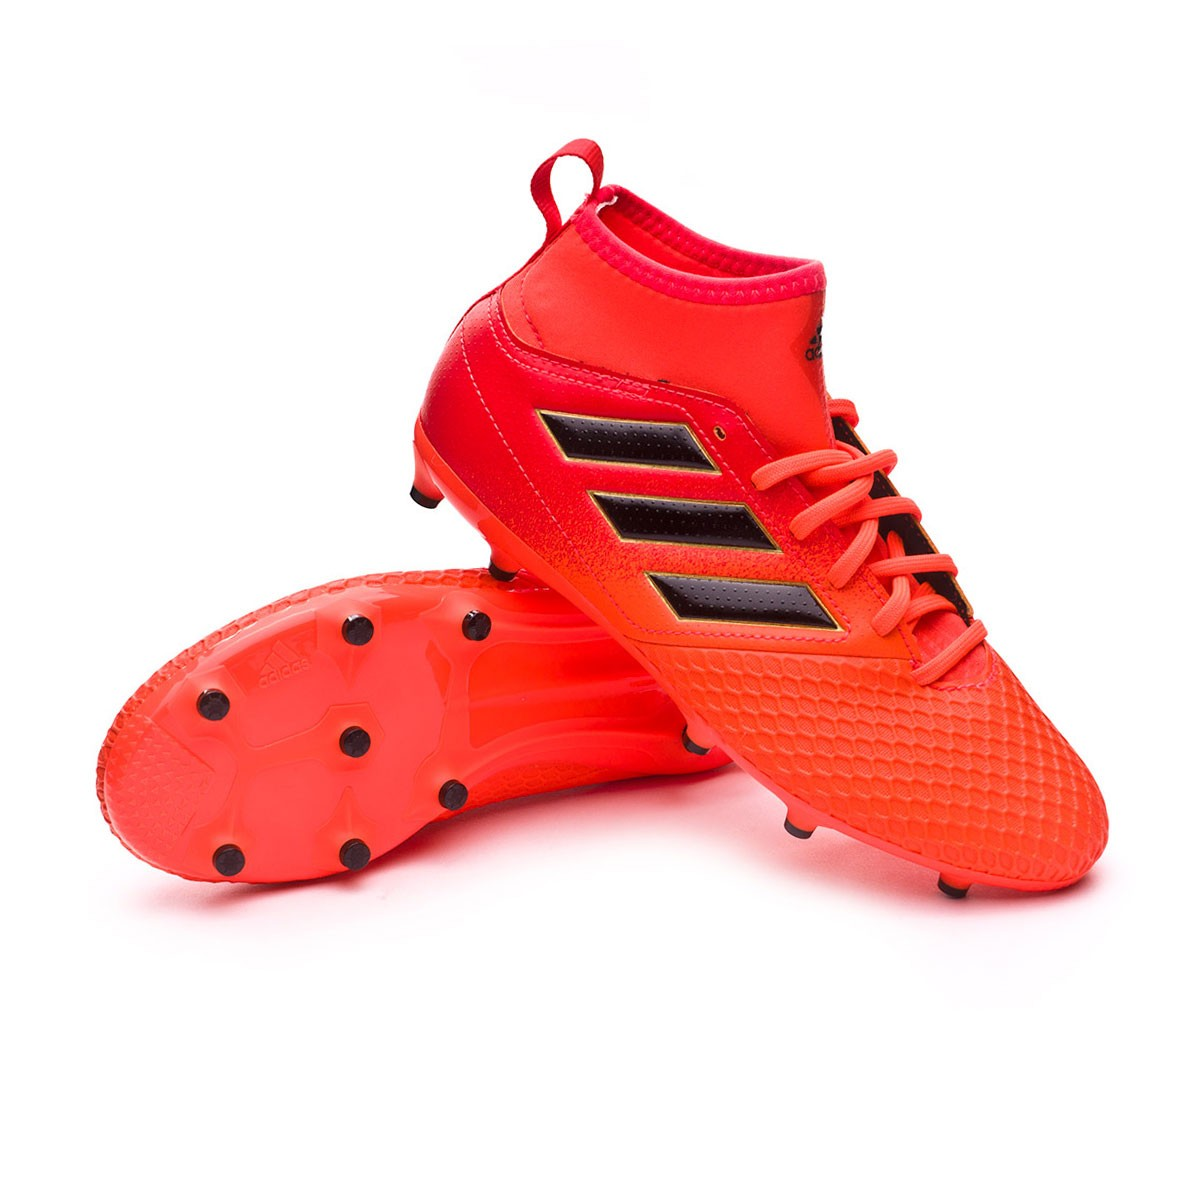 9319d3dae Bota de fútbol adidas Ace 17.3 FG Niño Solar orange-Core black-Solar red -  Tienda de fútbol Fútbol Emotion